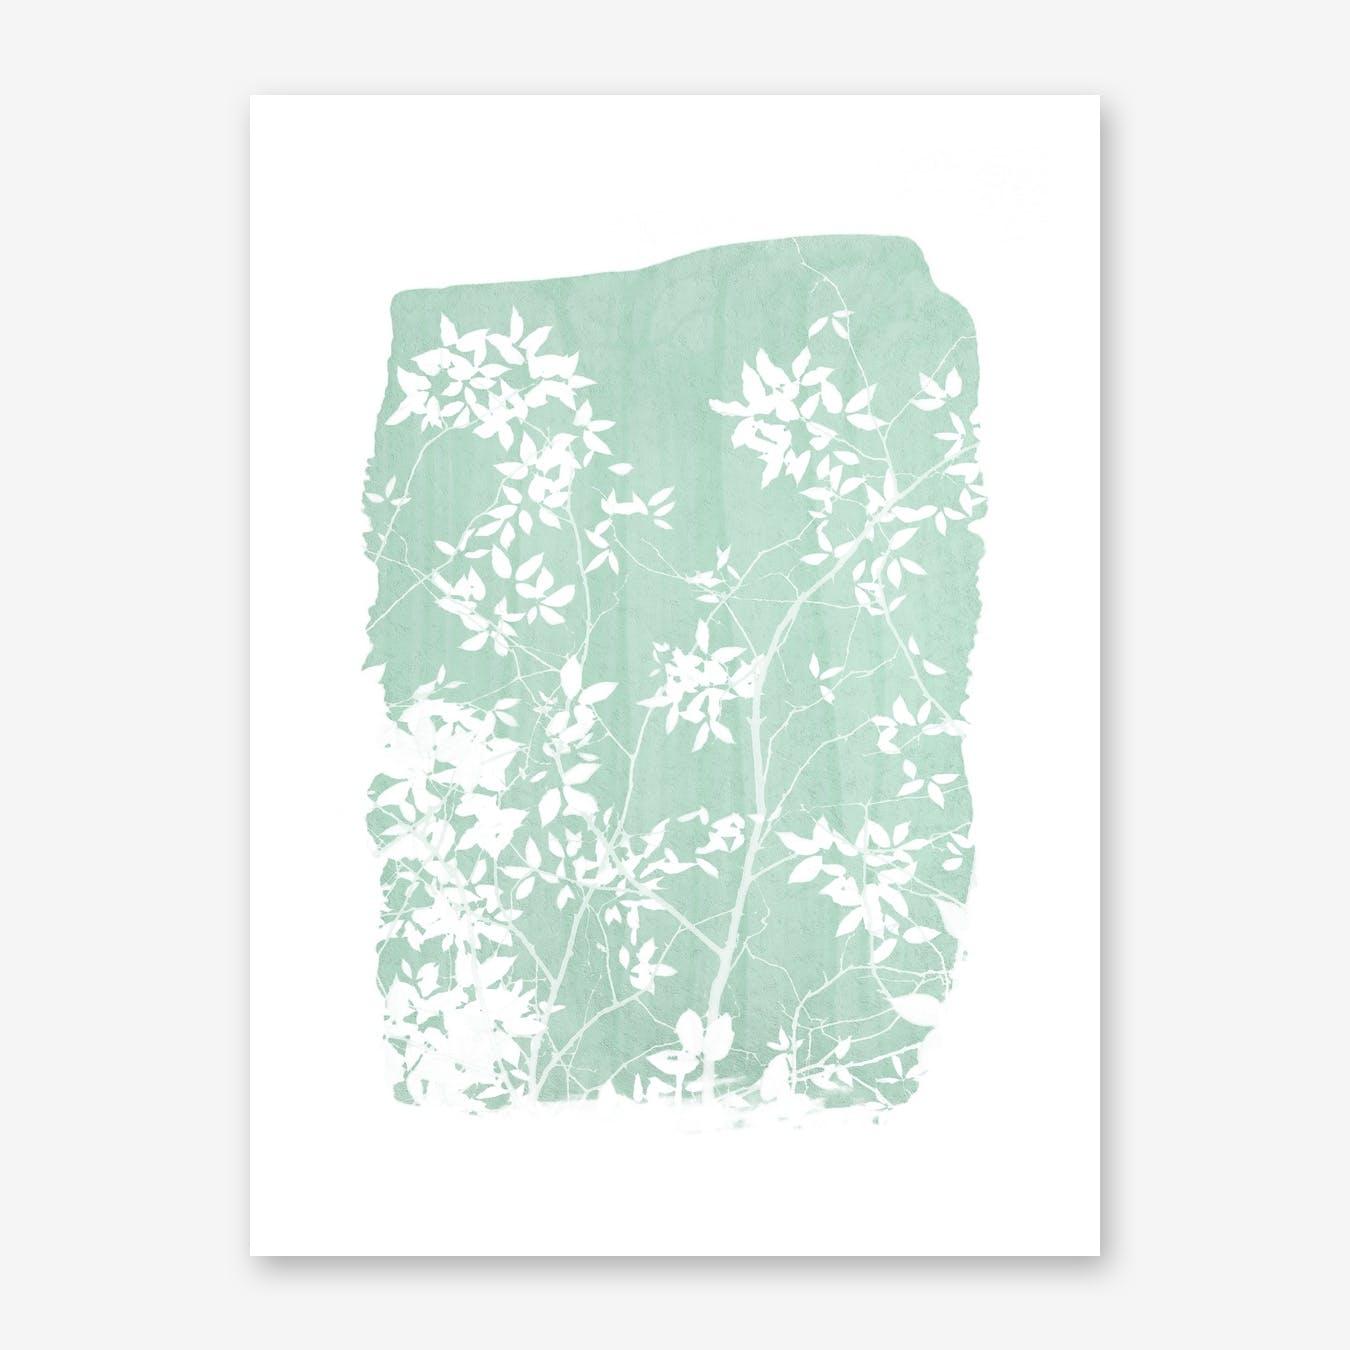 Foliage on Mint Green